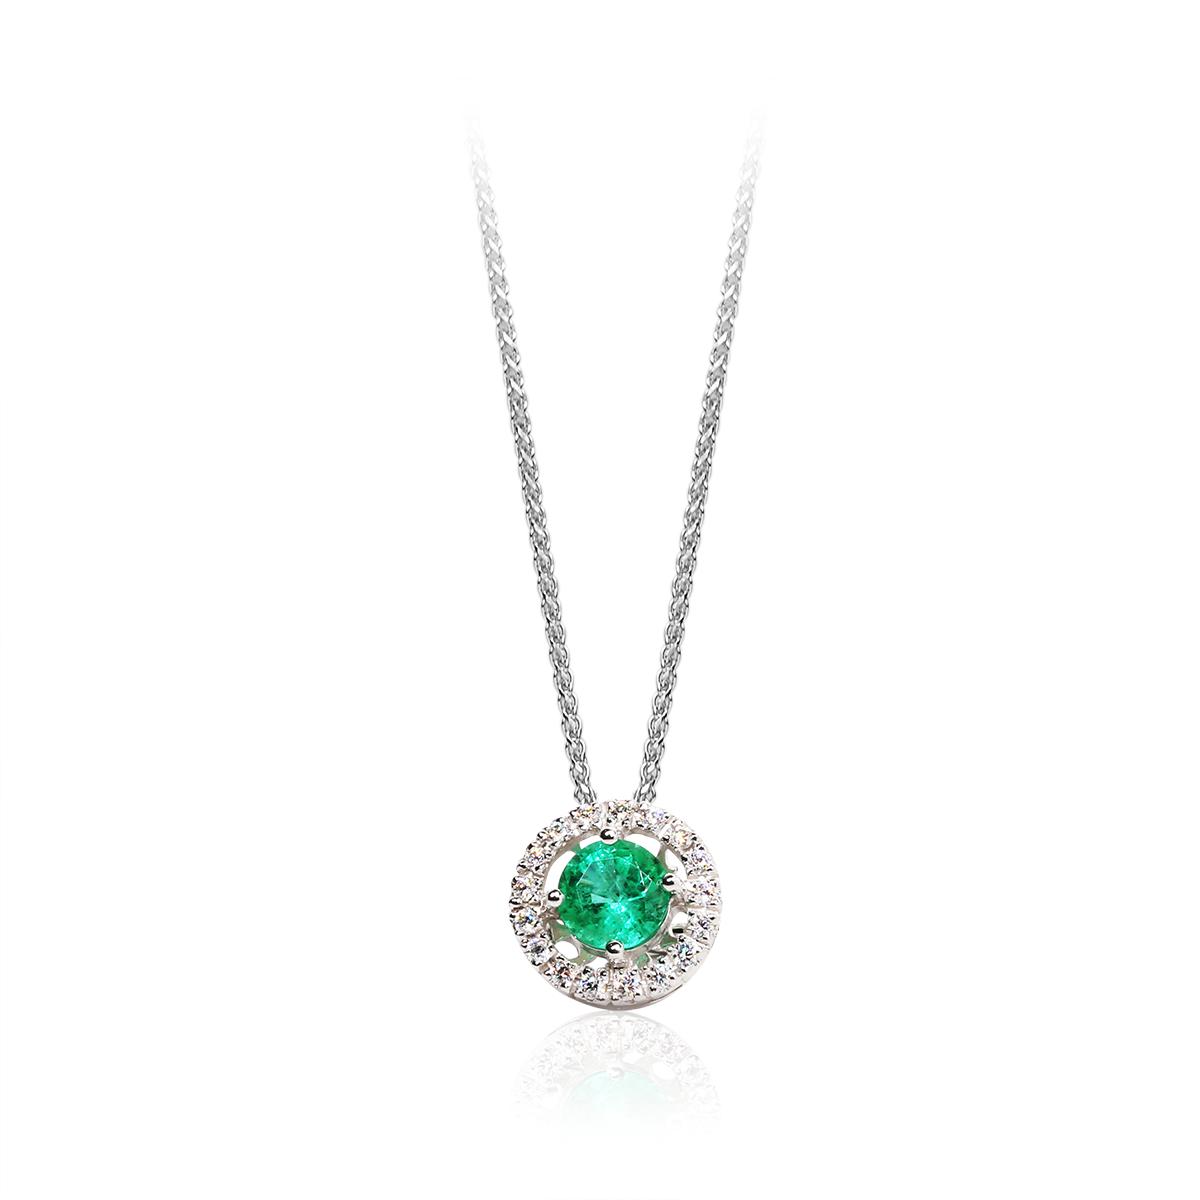 emeraldfi 6 mm - 1 x;diamond 0,01 ct - 17 x